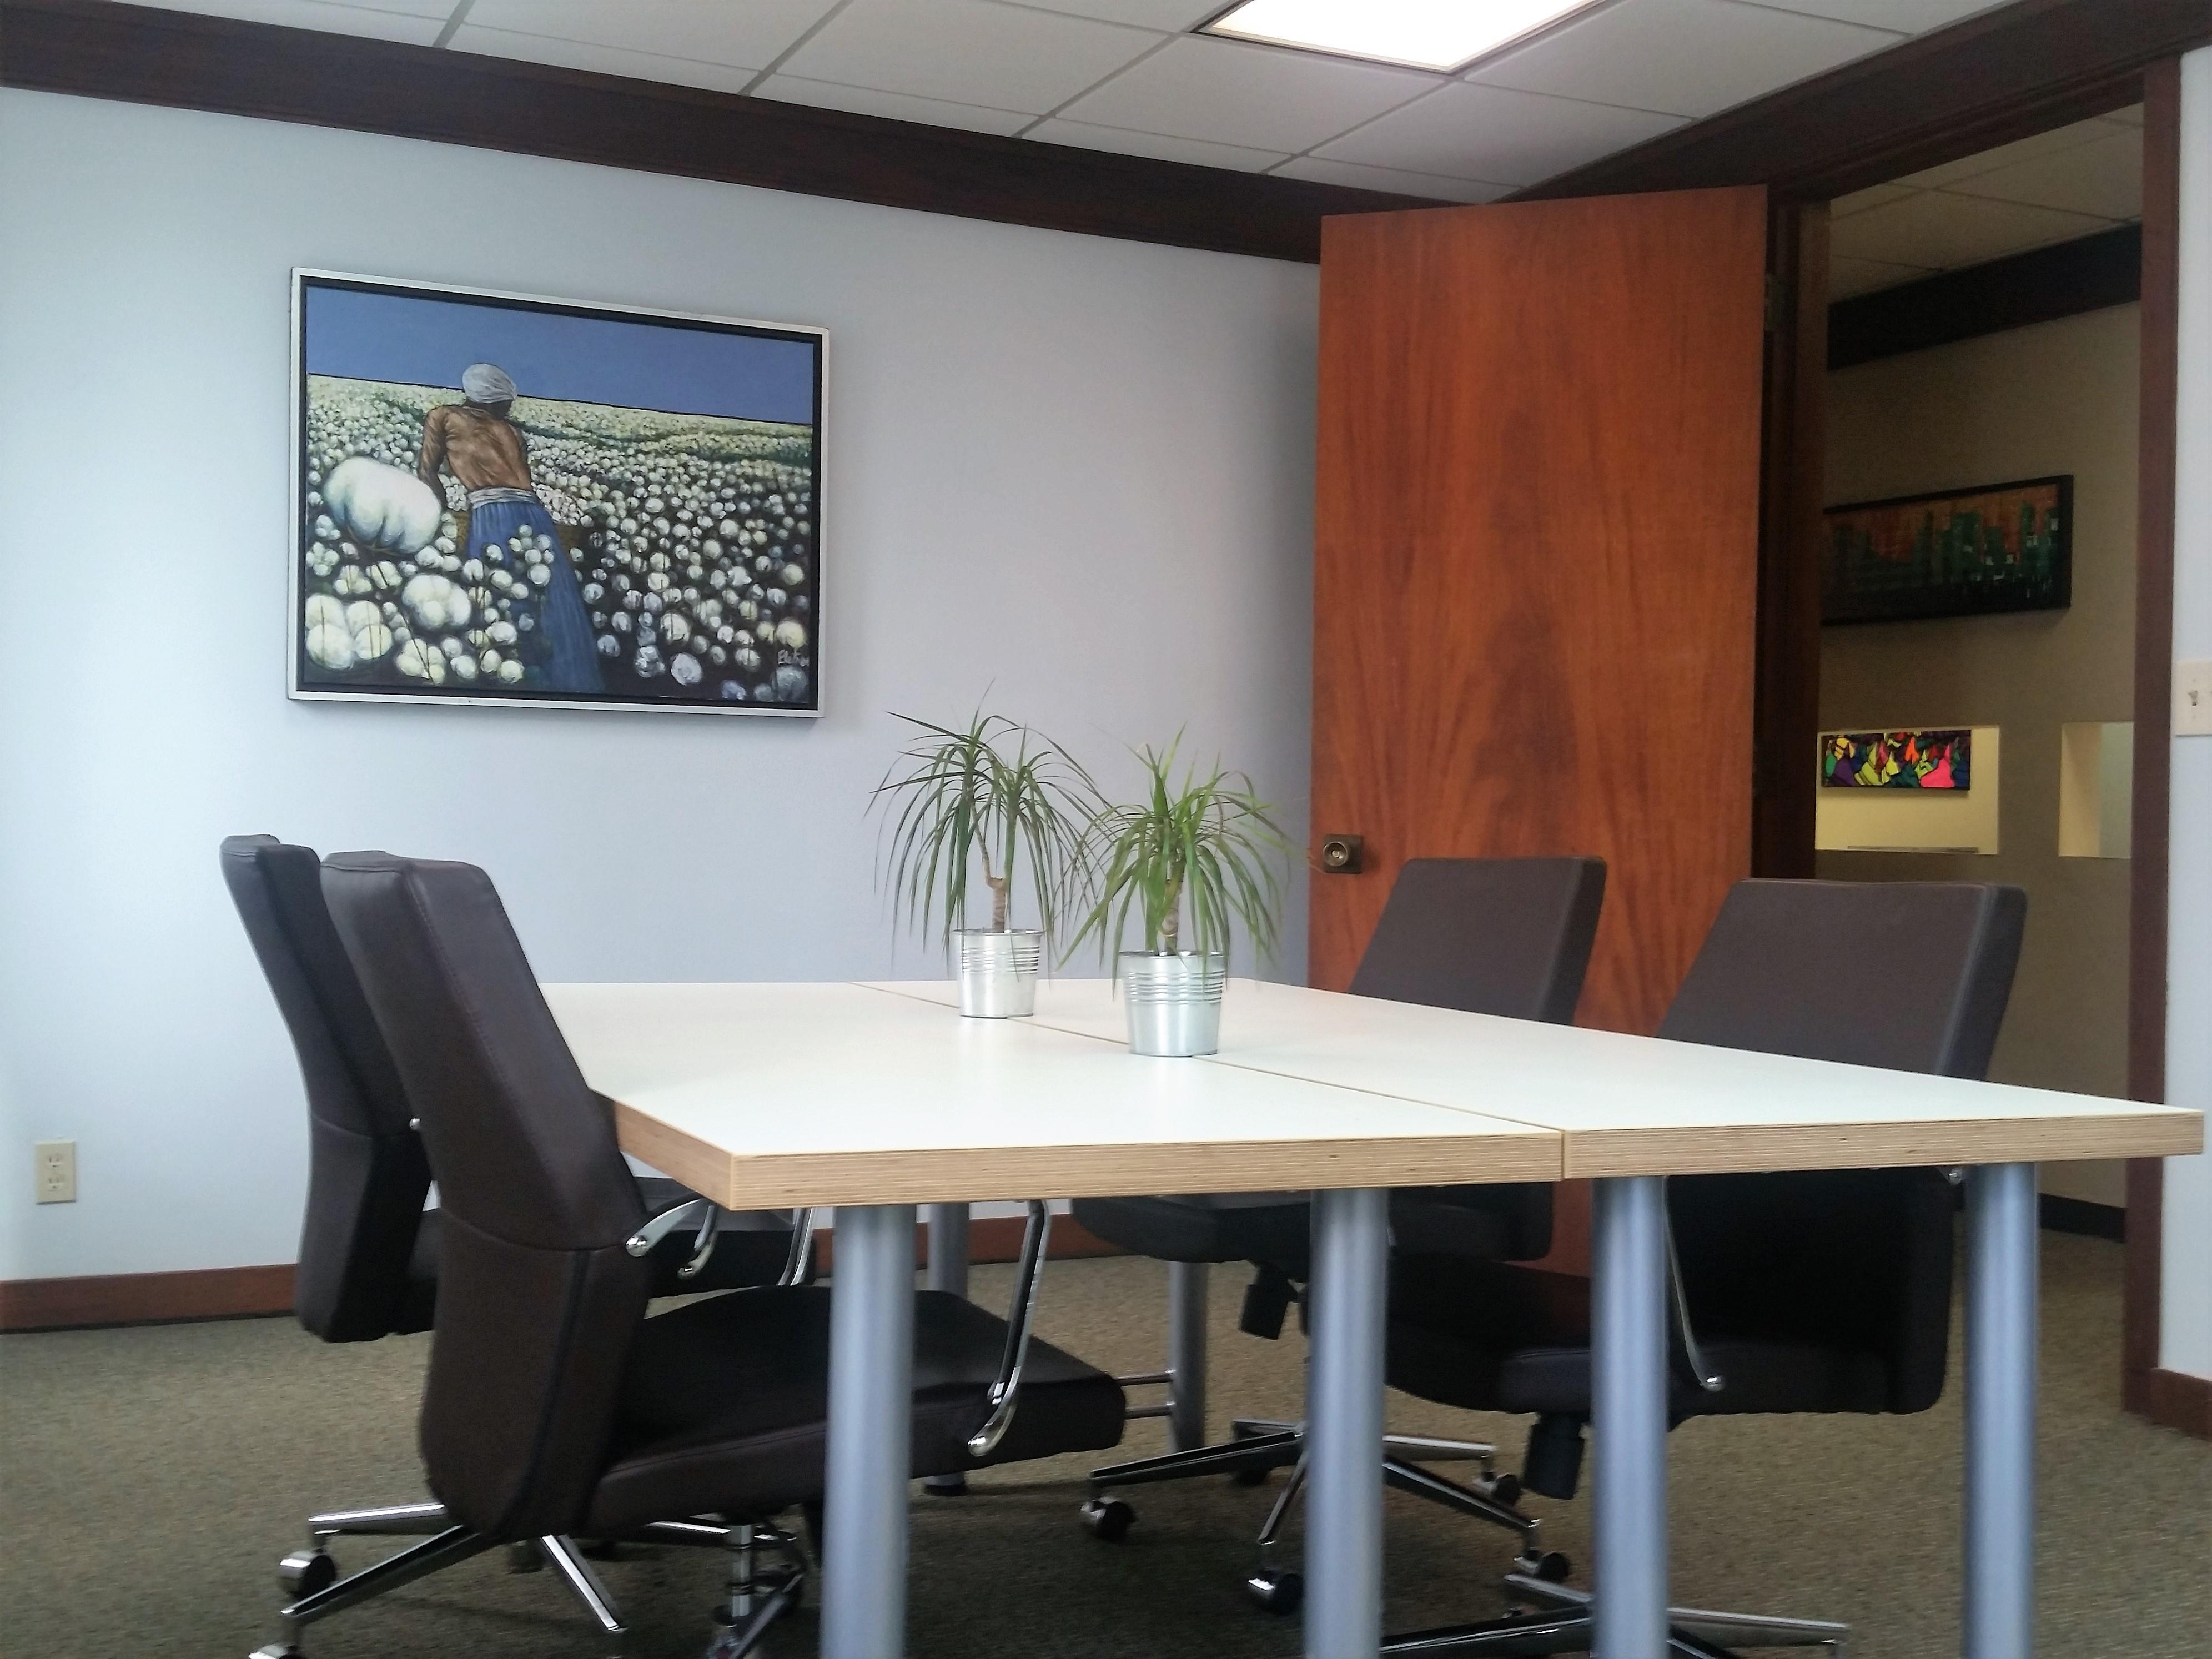 mindwarehouse - Conference Room B